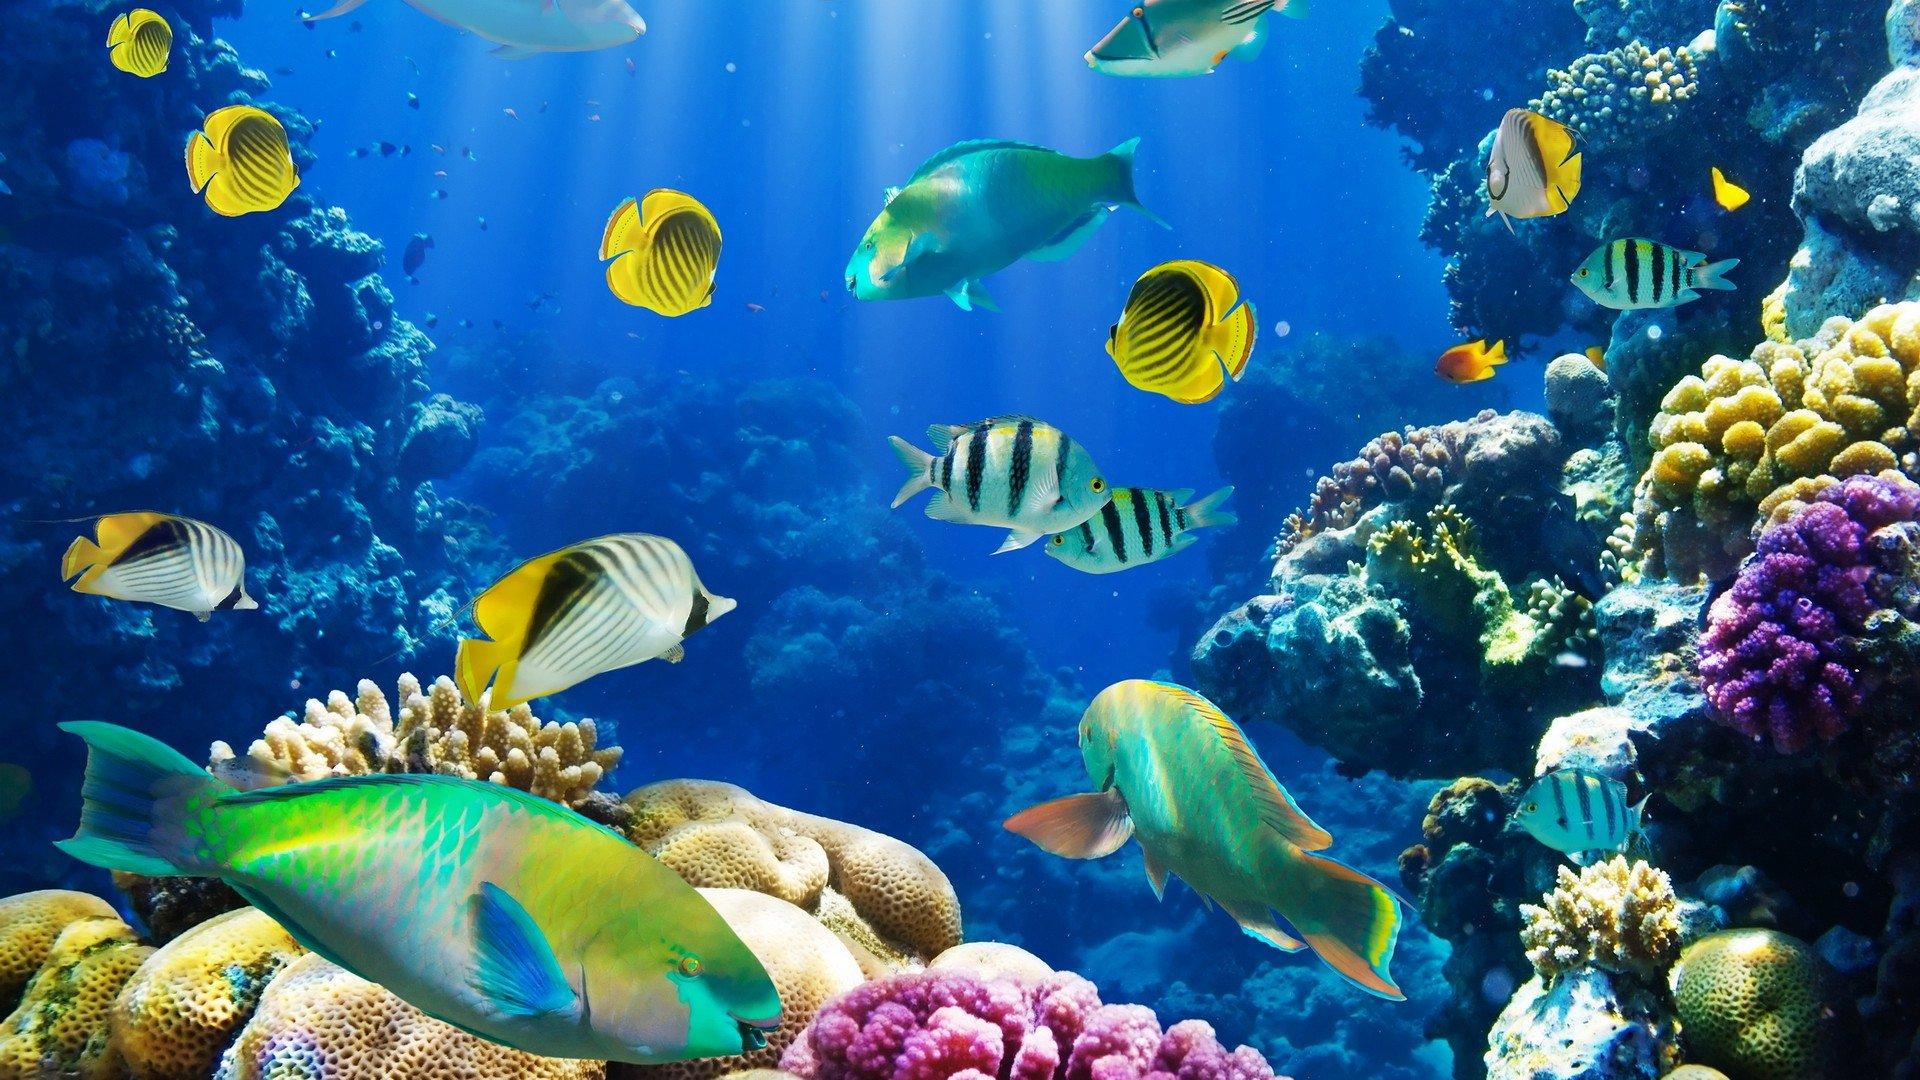 Nature fish coral reef exotic wallpaper 1920x1080 260738 1920x1080